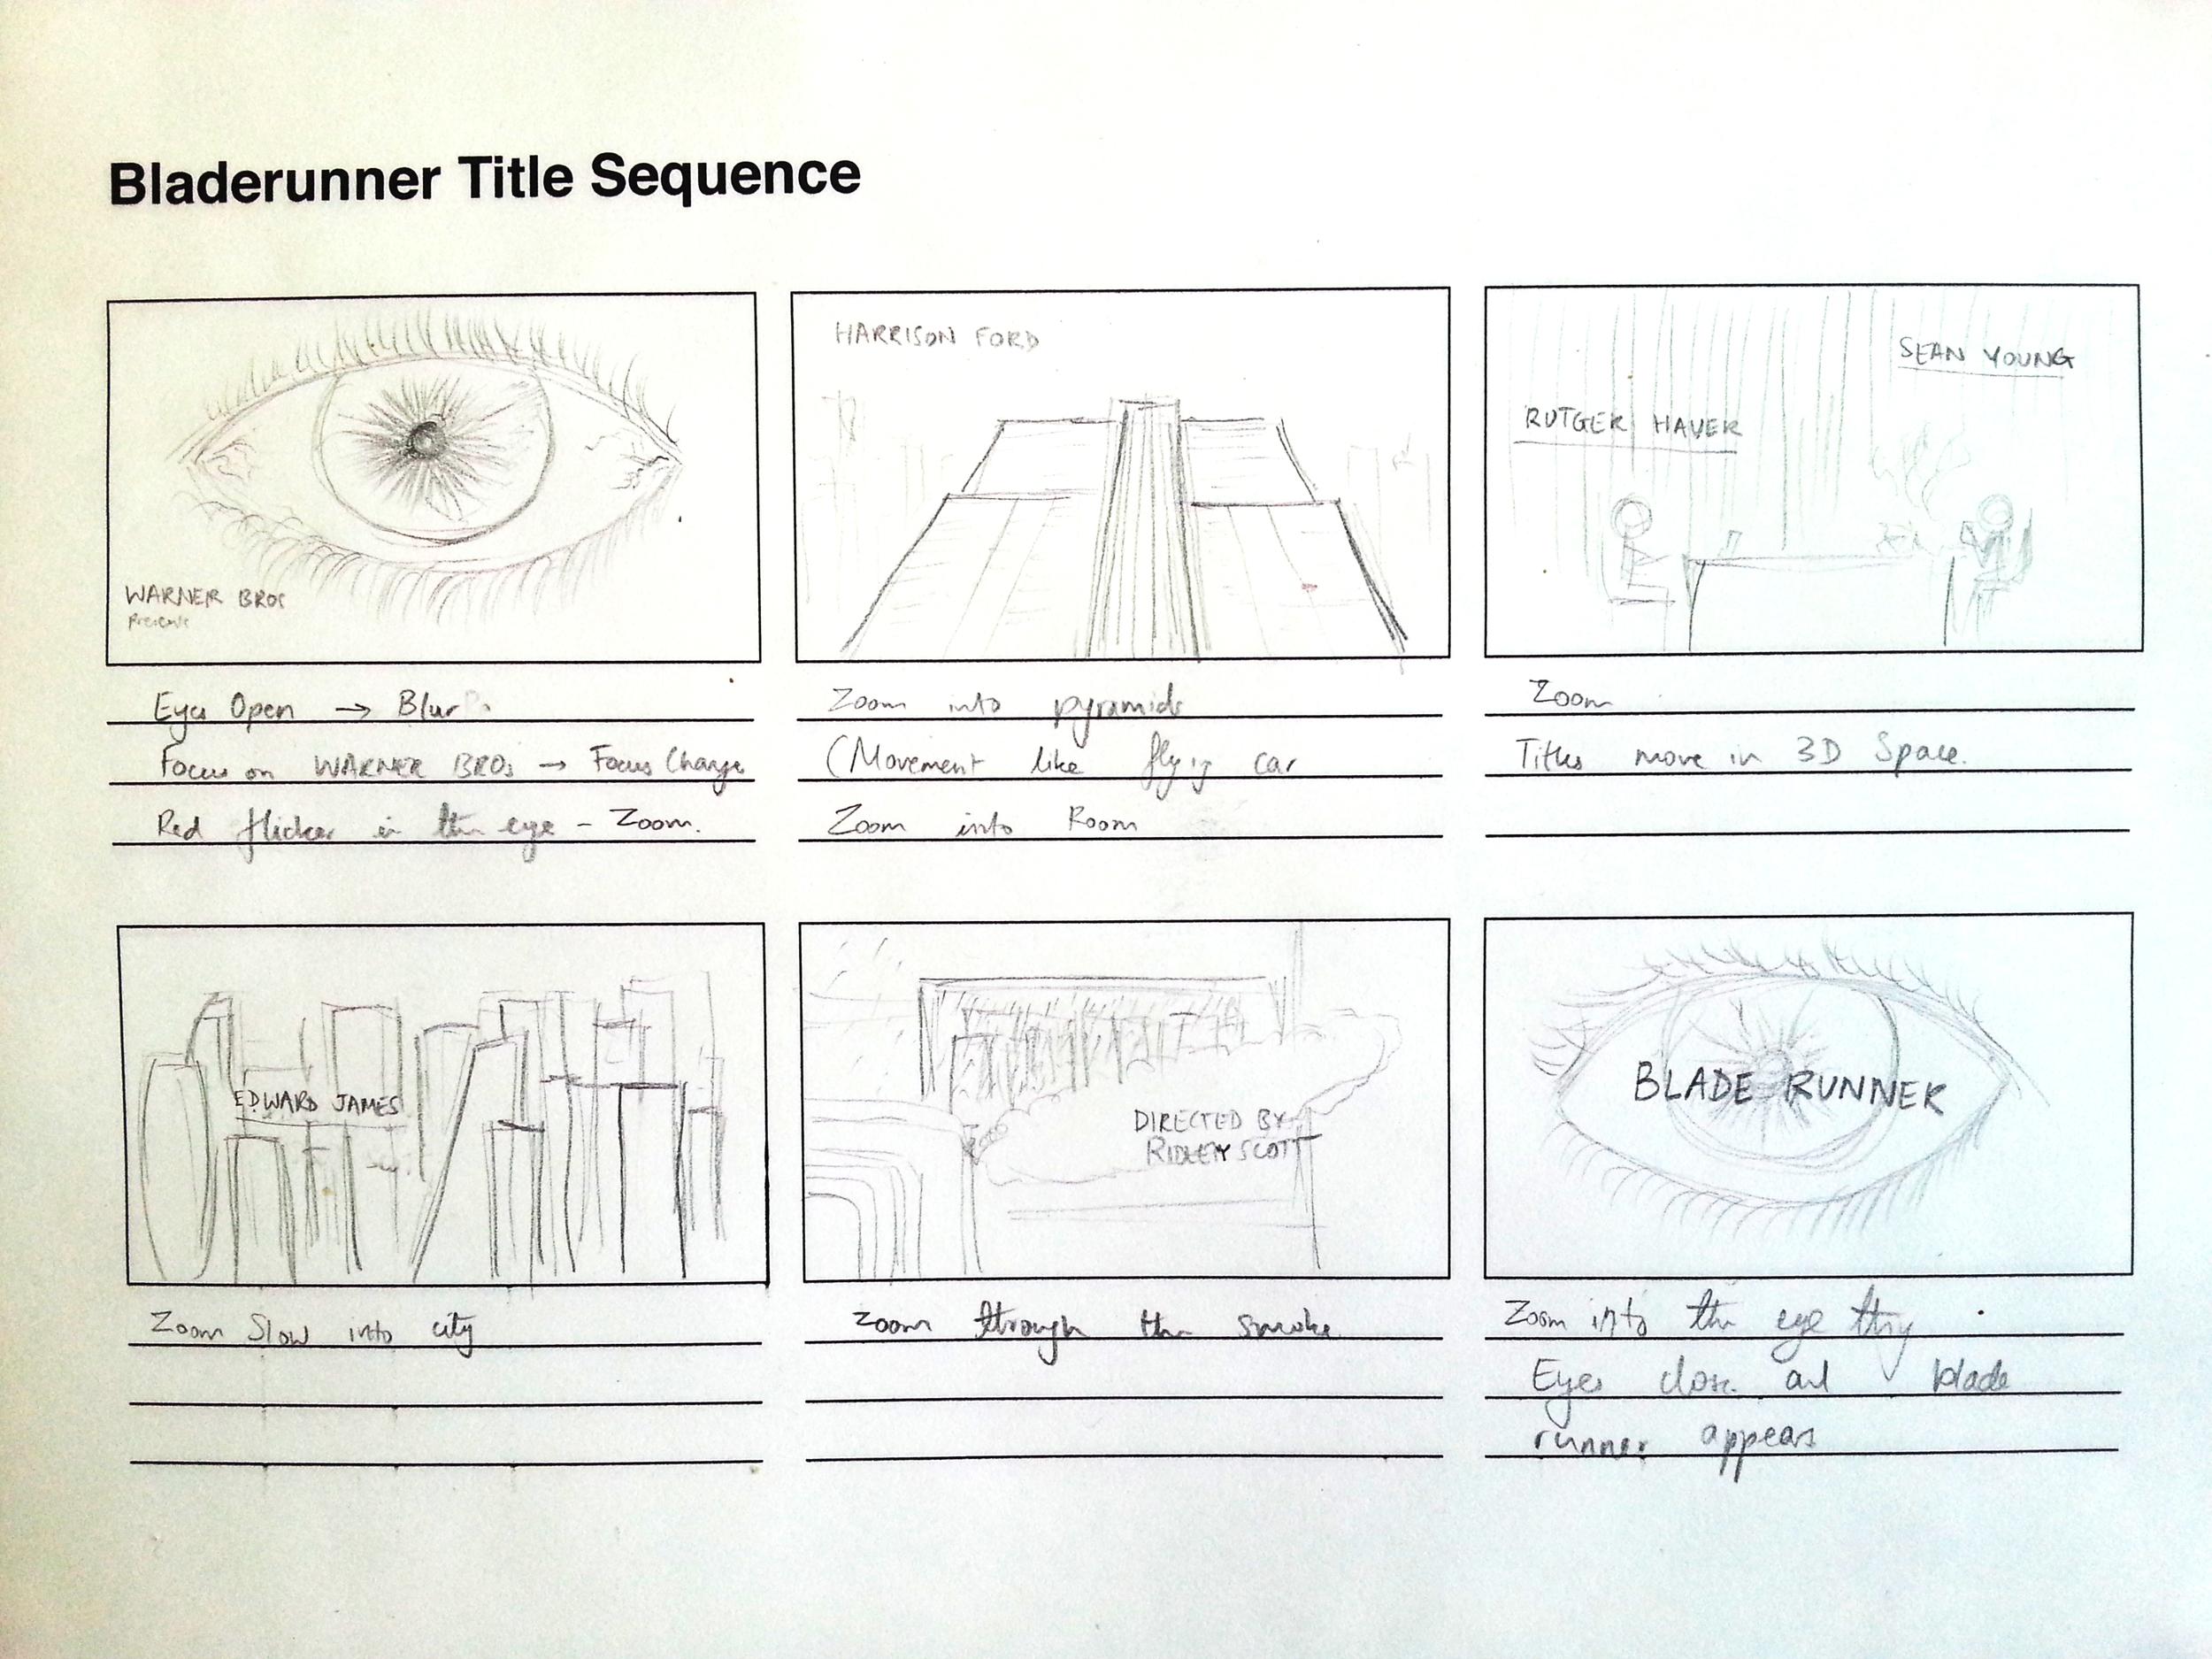 Bladerunner_Storyboard_Sultan.jpg